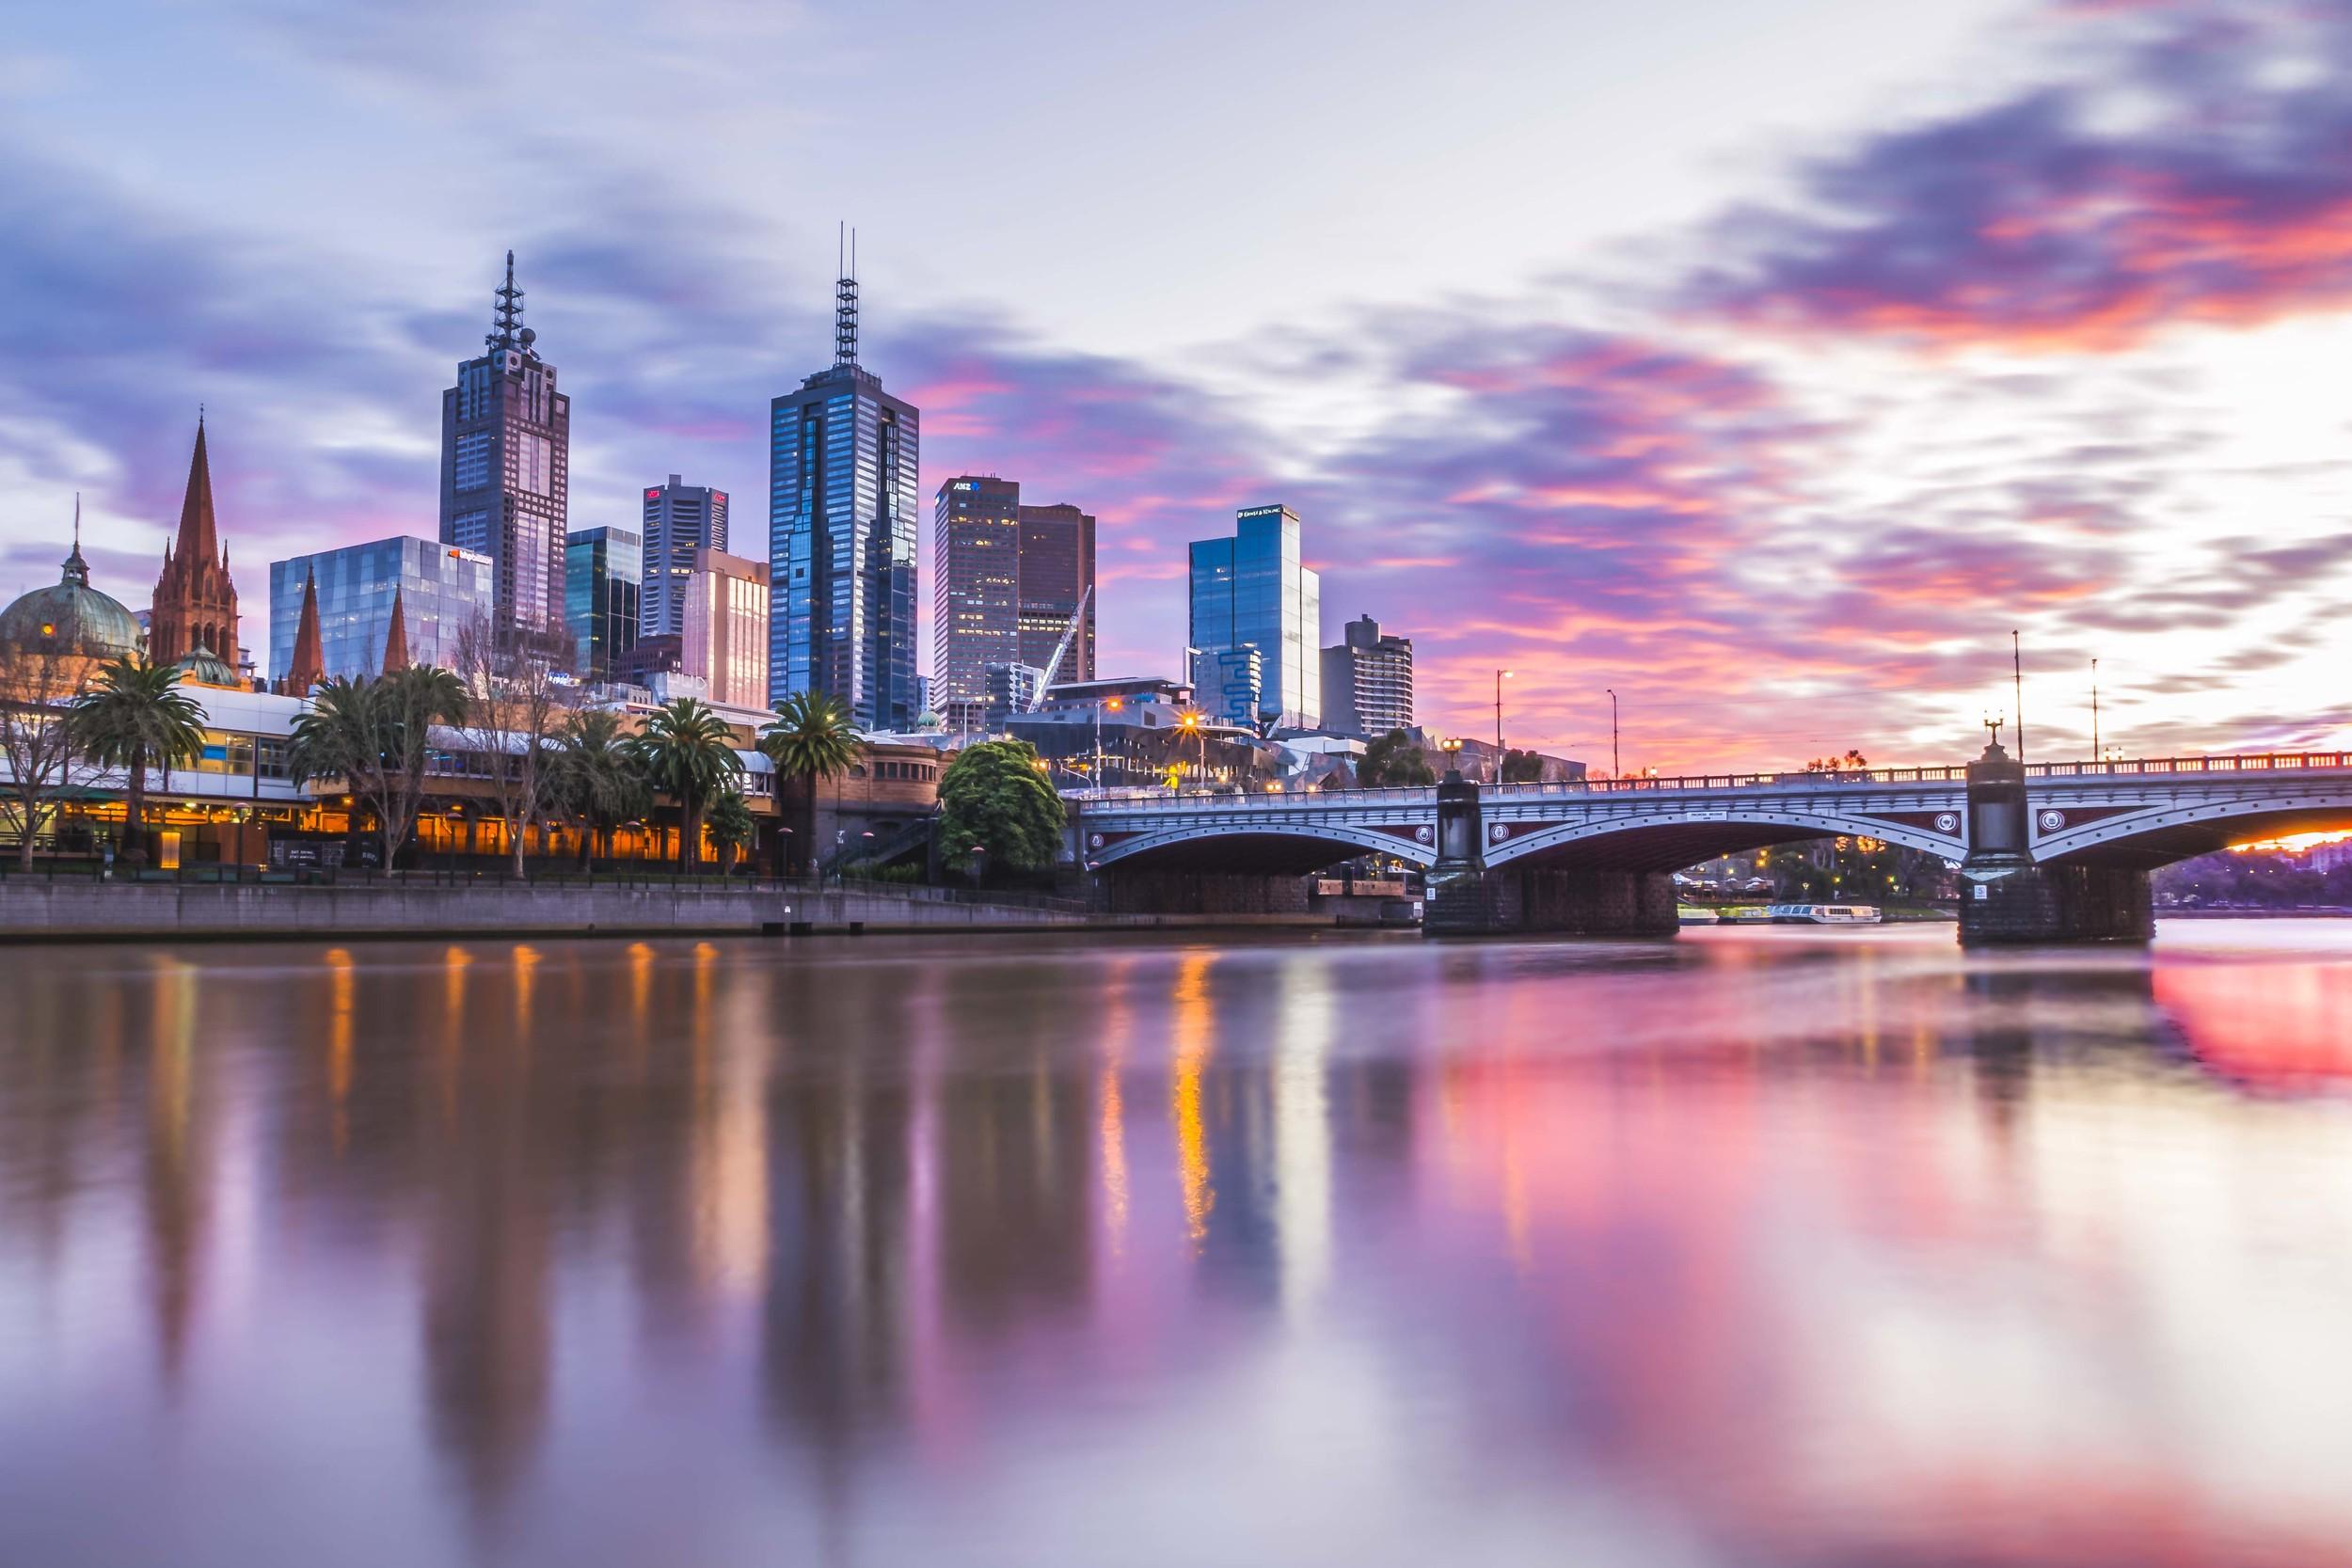 Sunrise Over The Yarra River